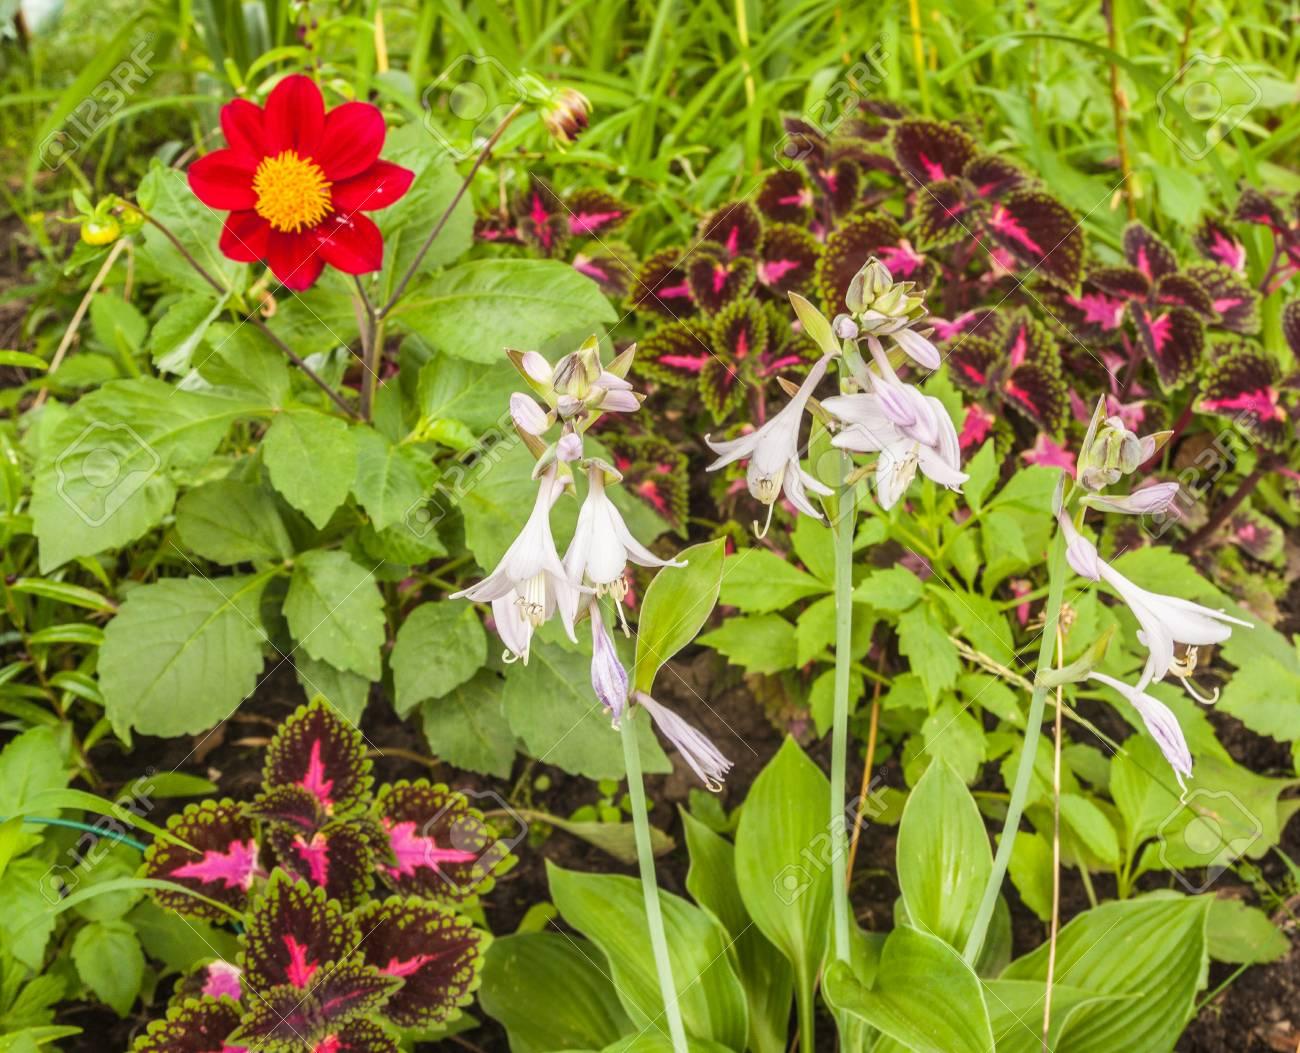 Flowerbed Of Dahlia Coleus And Hosta In Garden Harmonious